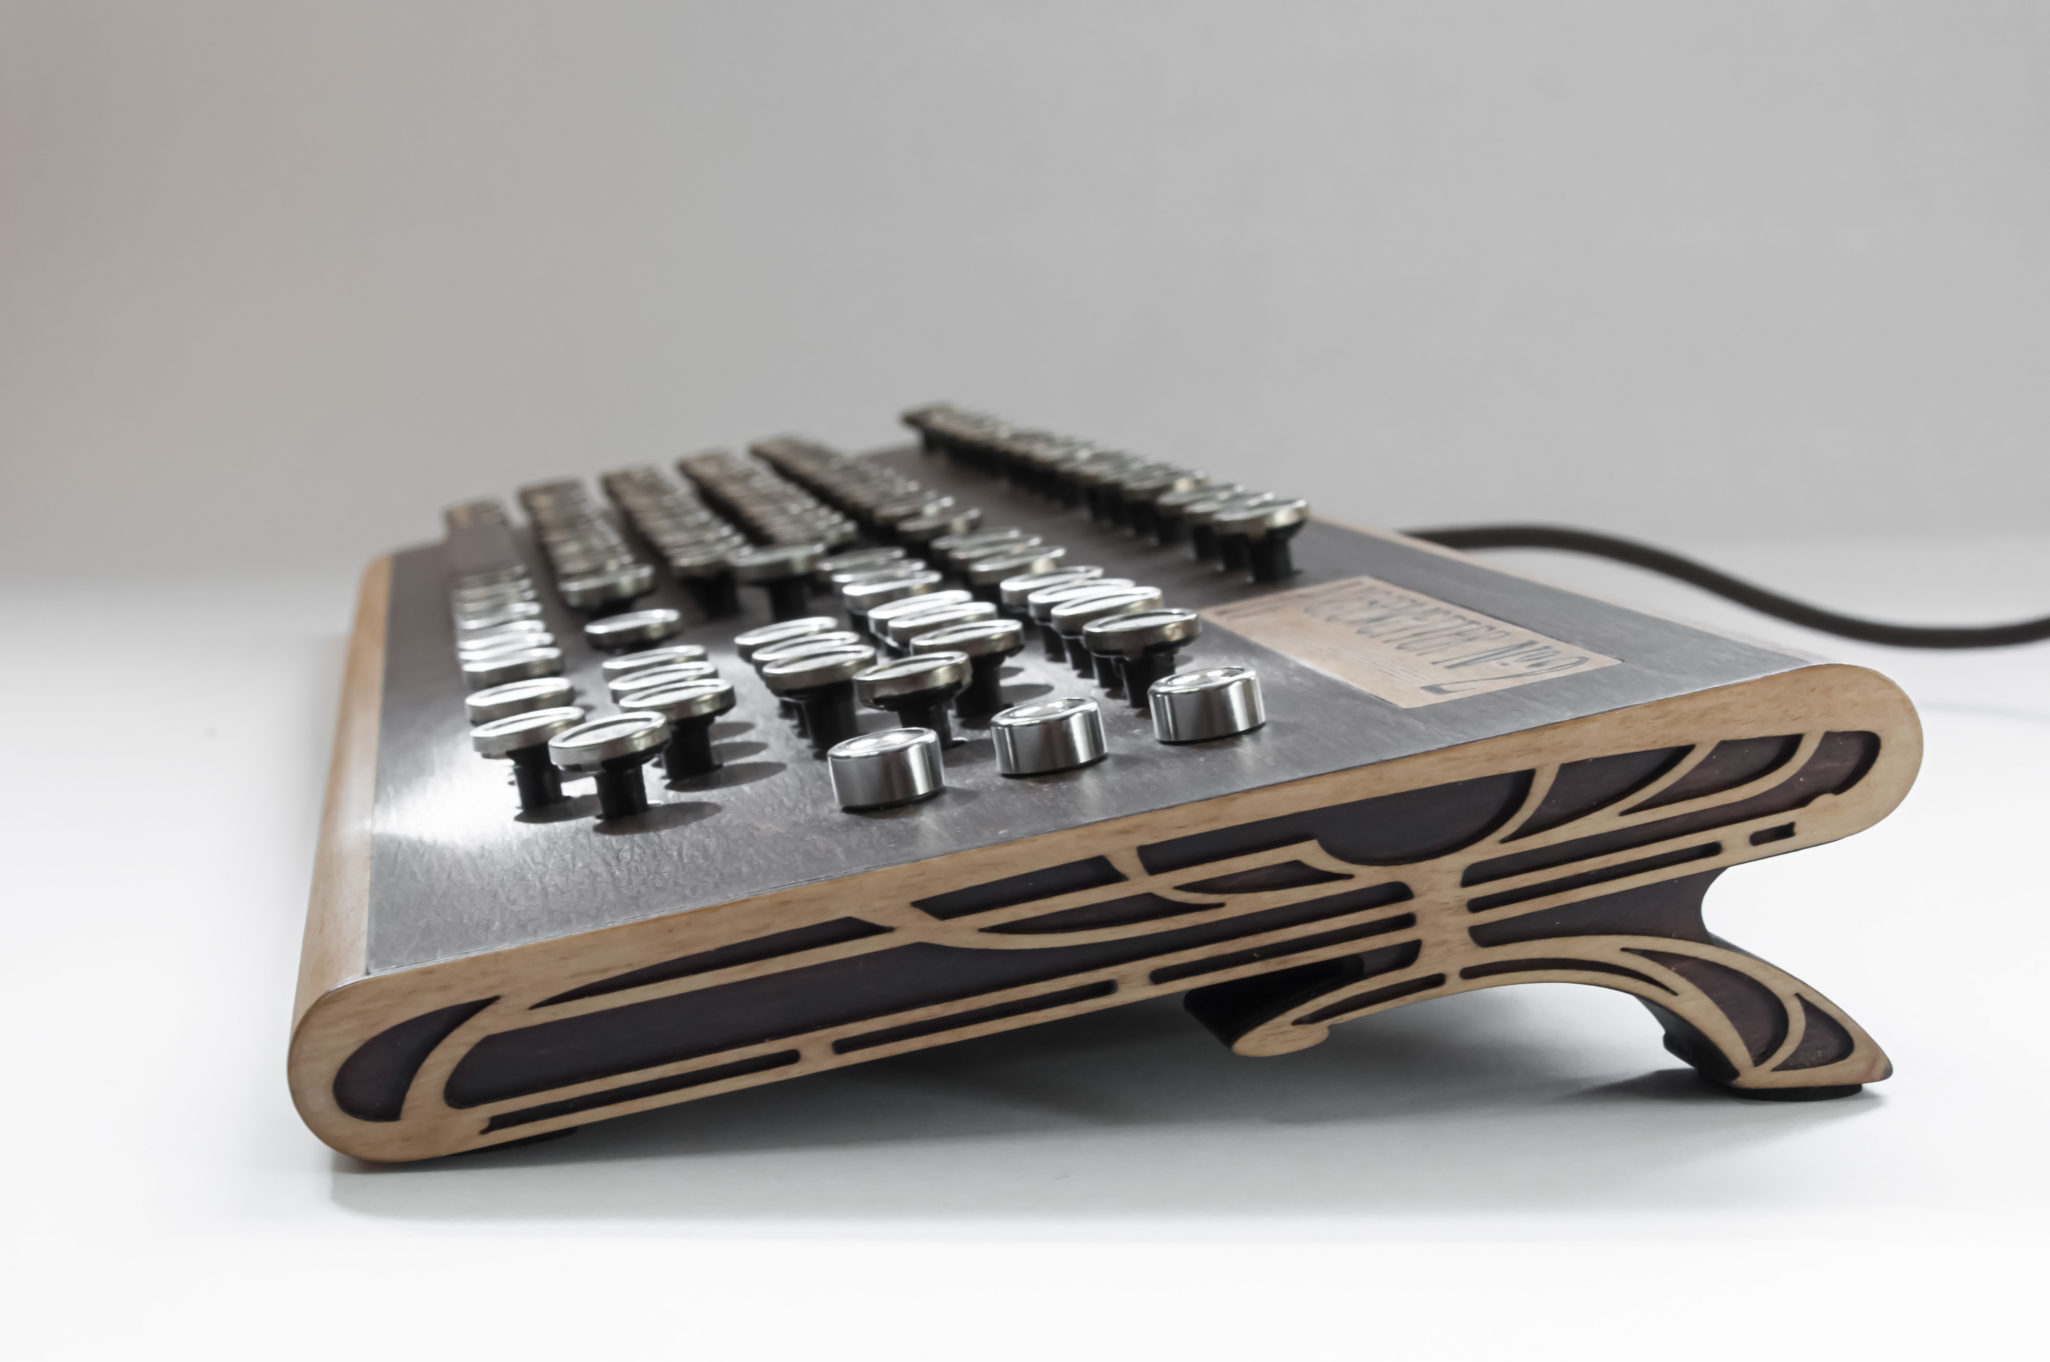 steampunk_keyboard_no2 produktphoto (049)